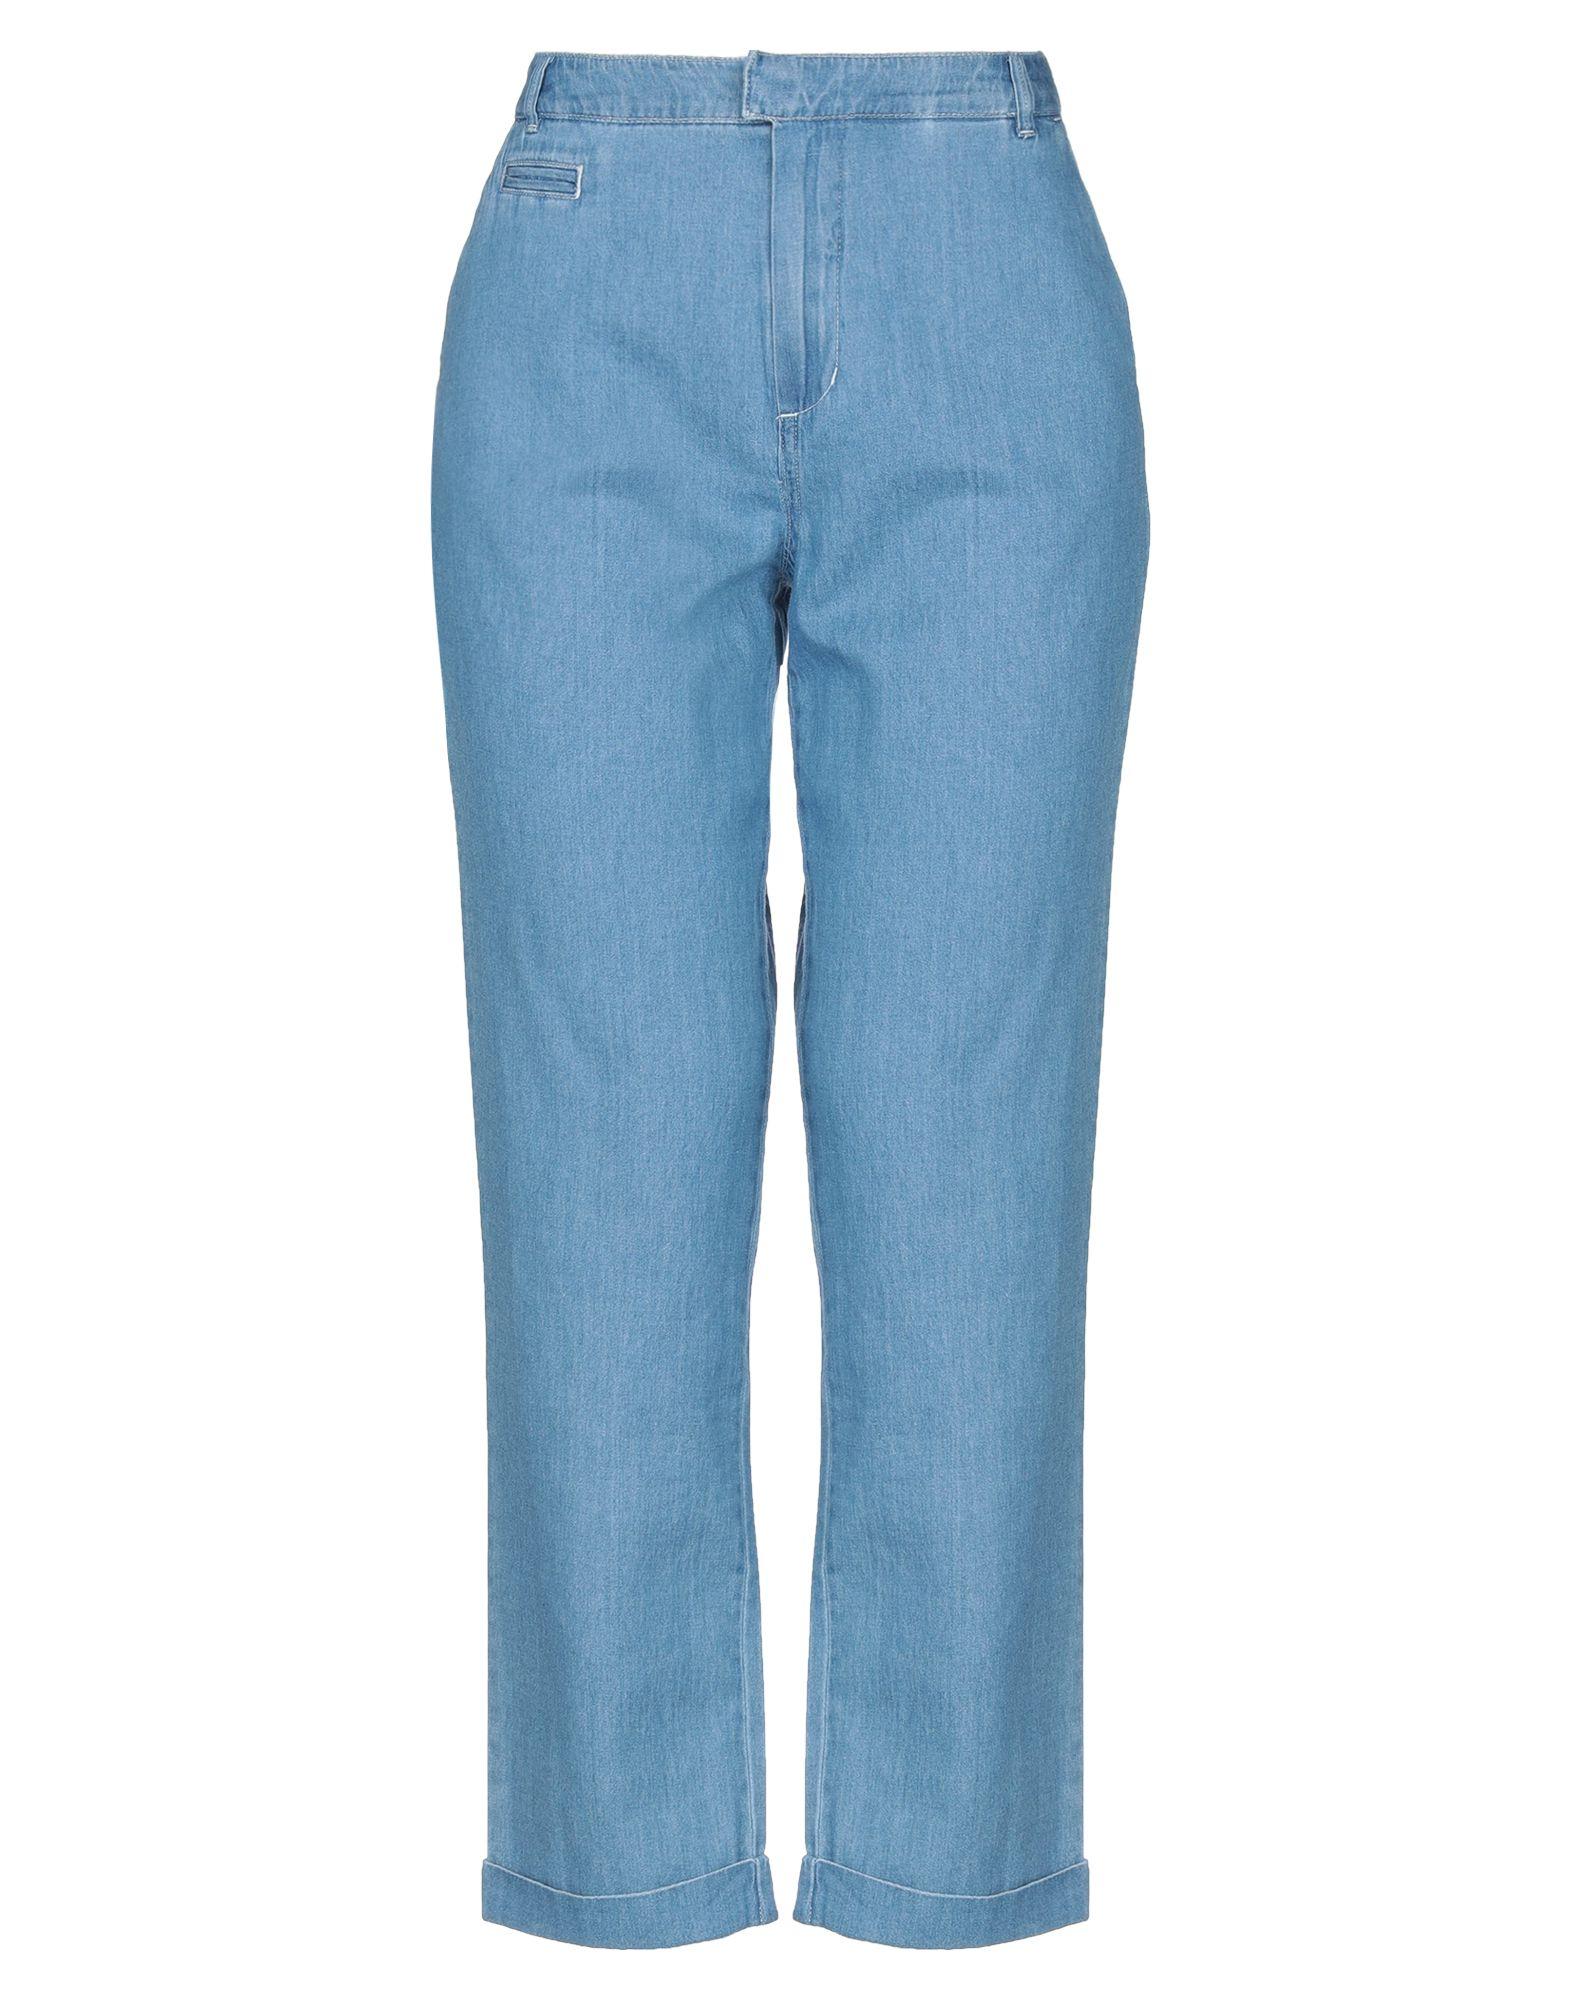 TOMMY HILFIGER Denim pants - Item 42784492